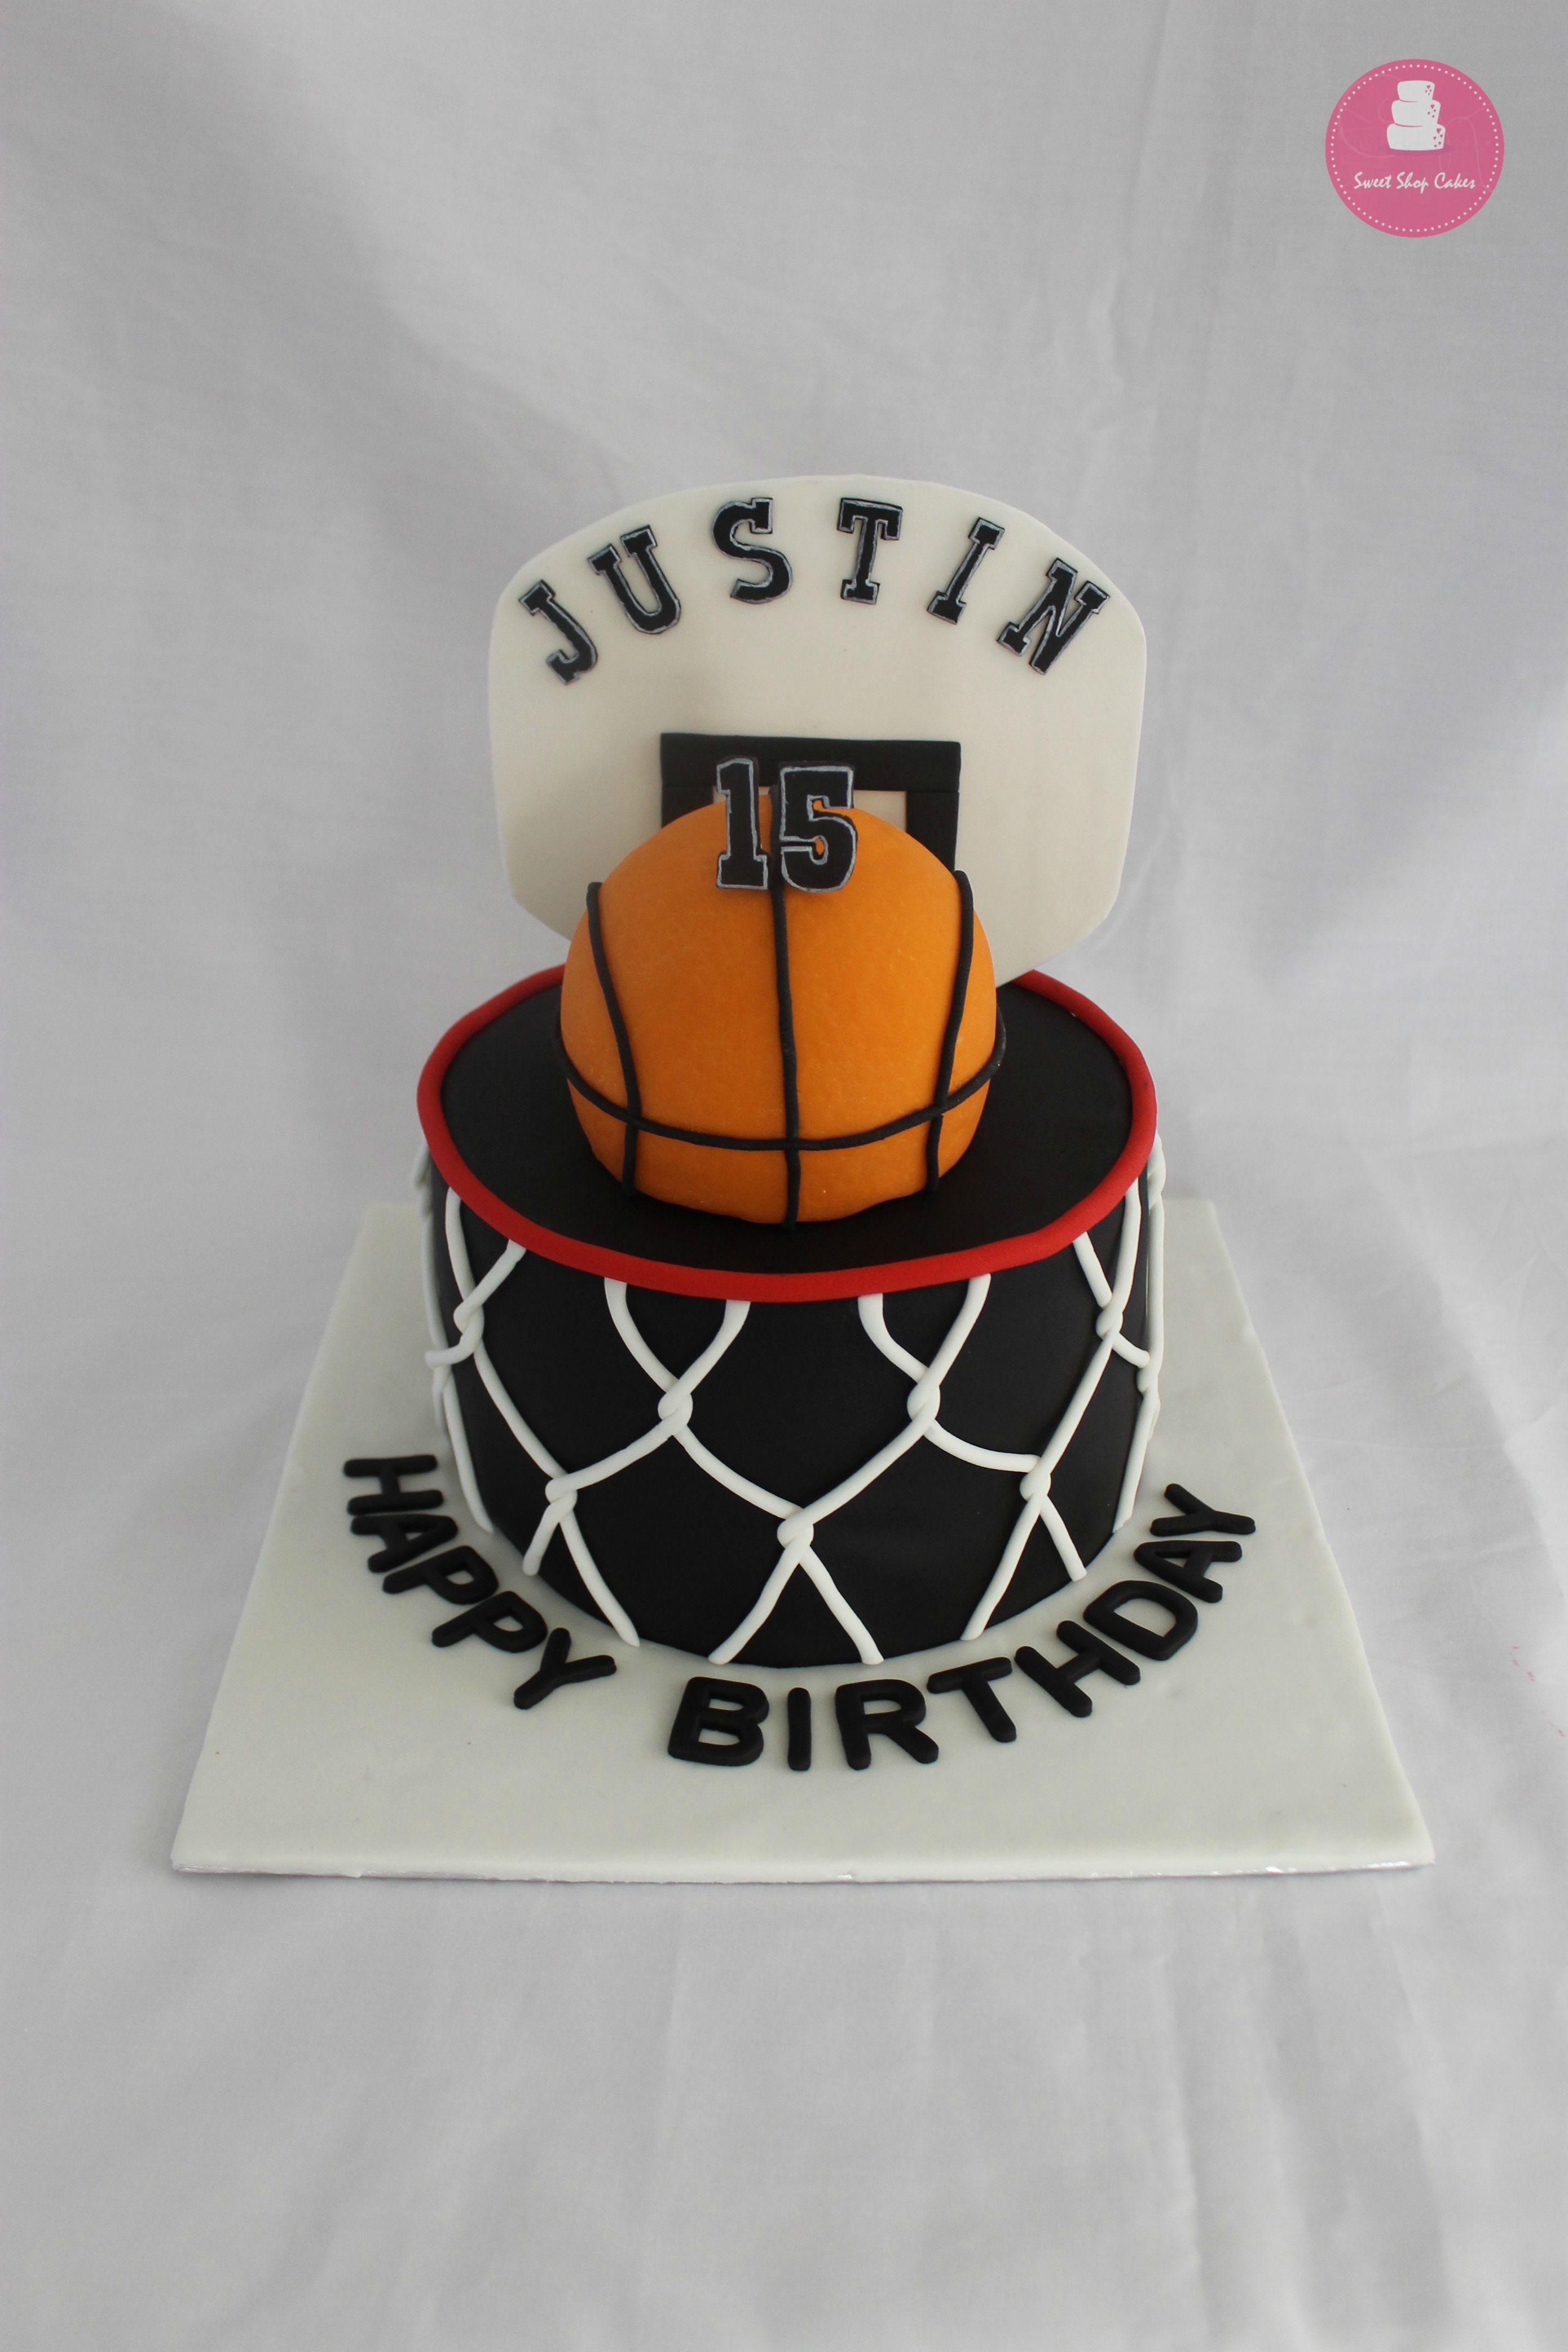 Basketball themed birthday cake cakes Pinterest Birthday cakes